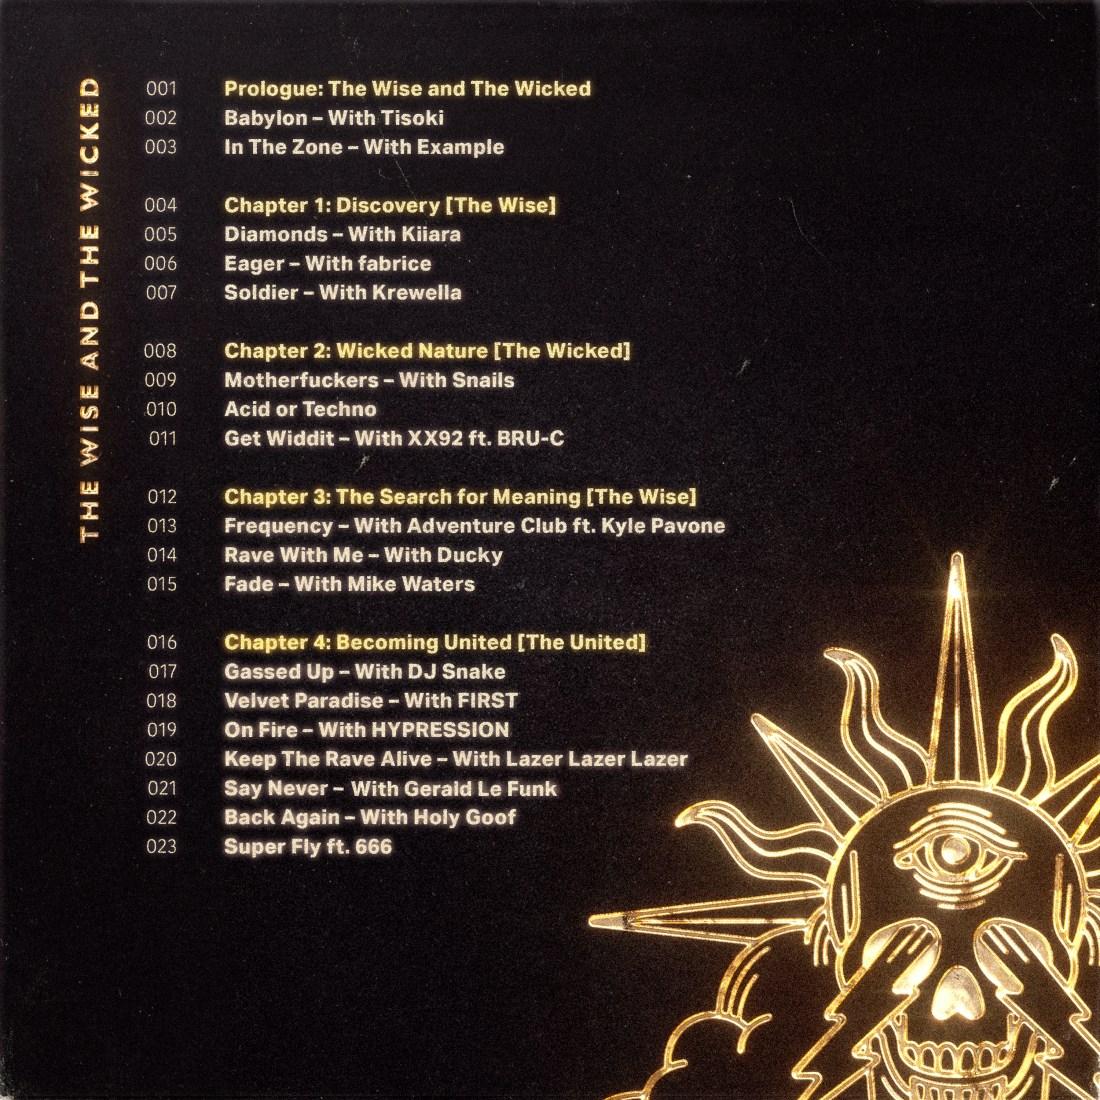 tracklist6[1]